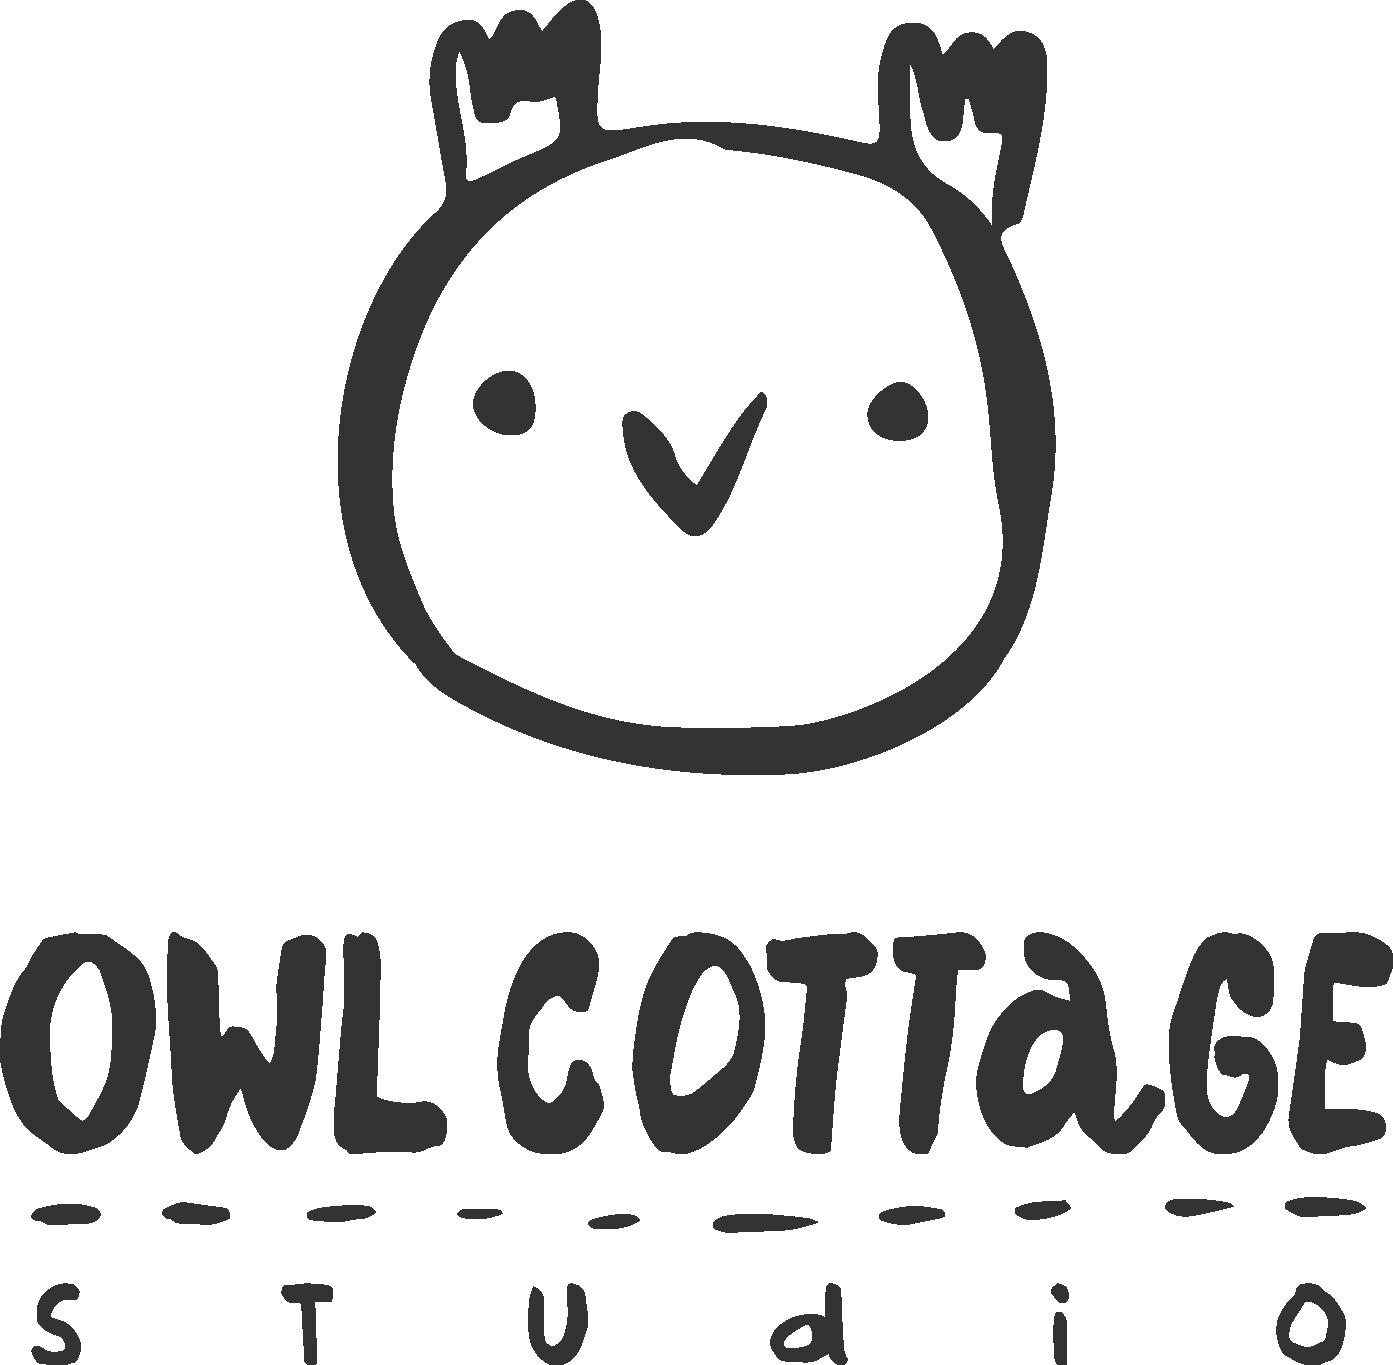 Owl Cottage Studio